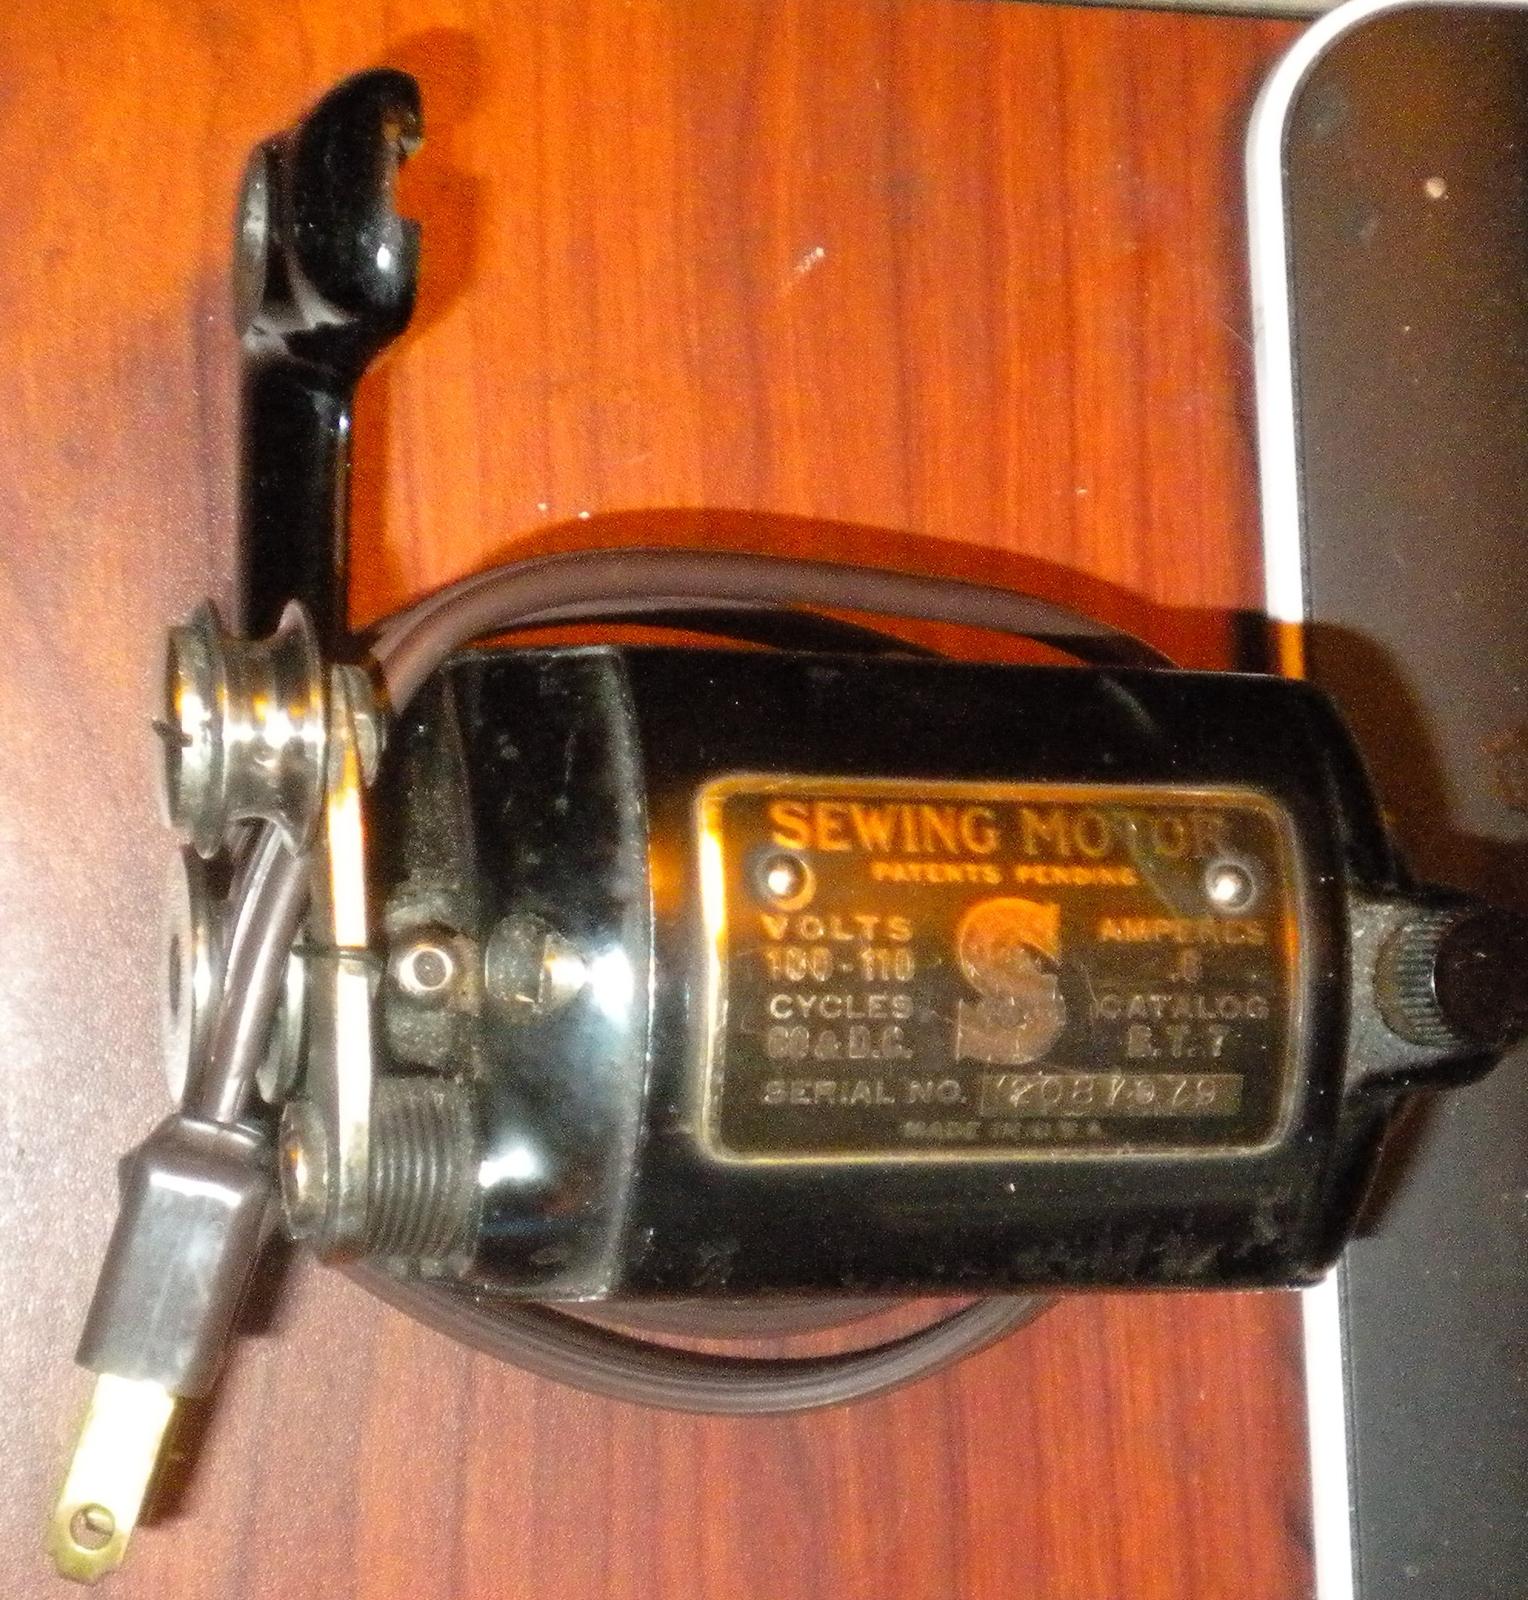 Vintage singer sewing motor 06 amp bt7 and 50 similar items dscn2642 fandeluxe Gallery